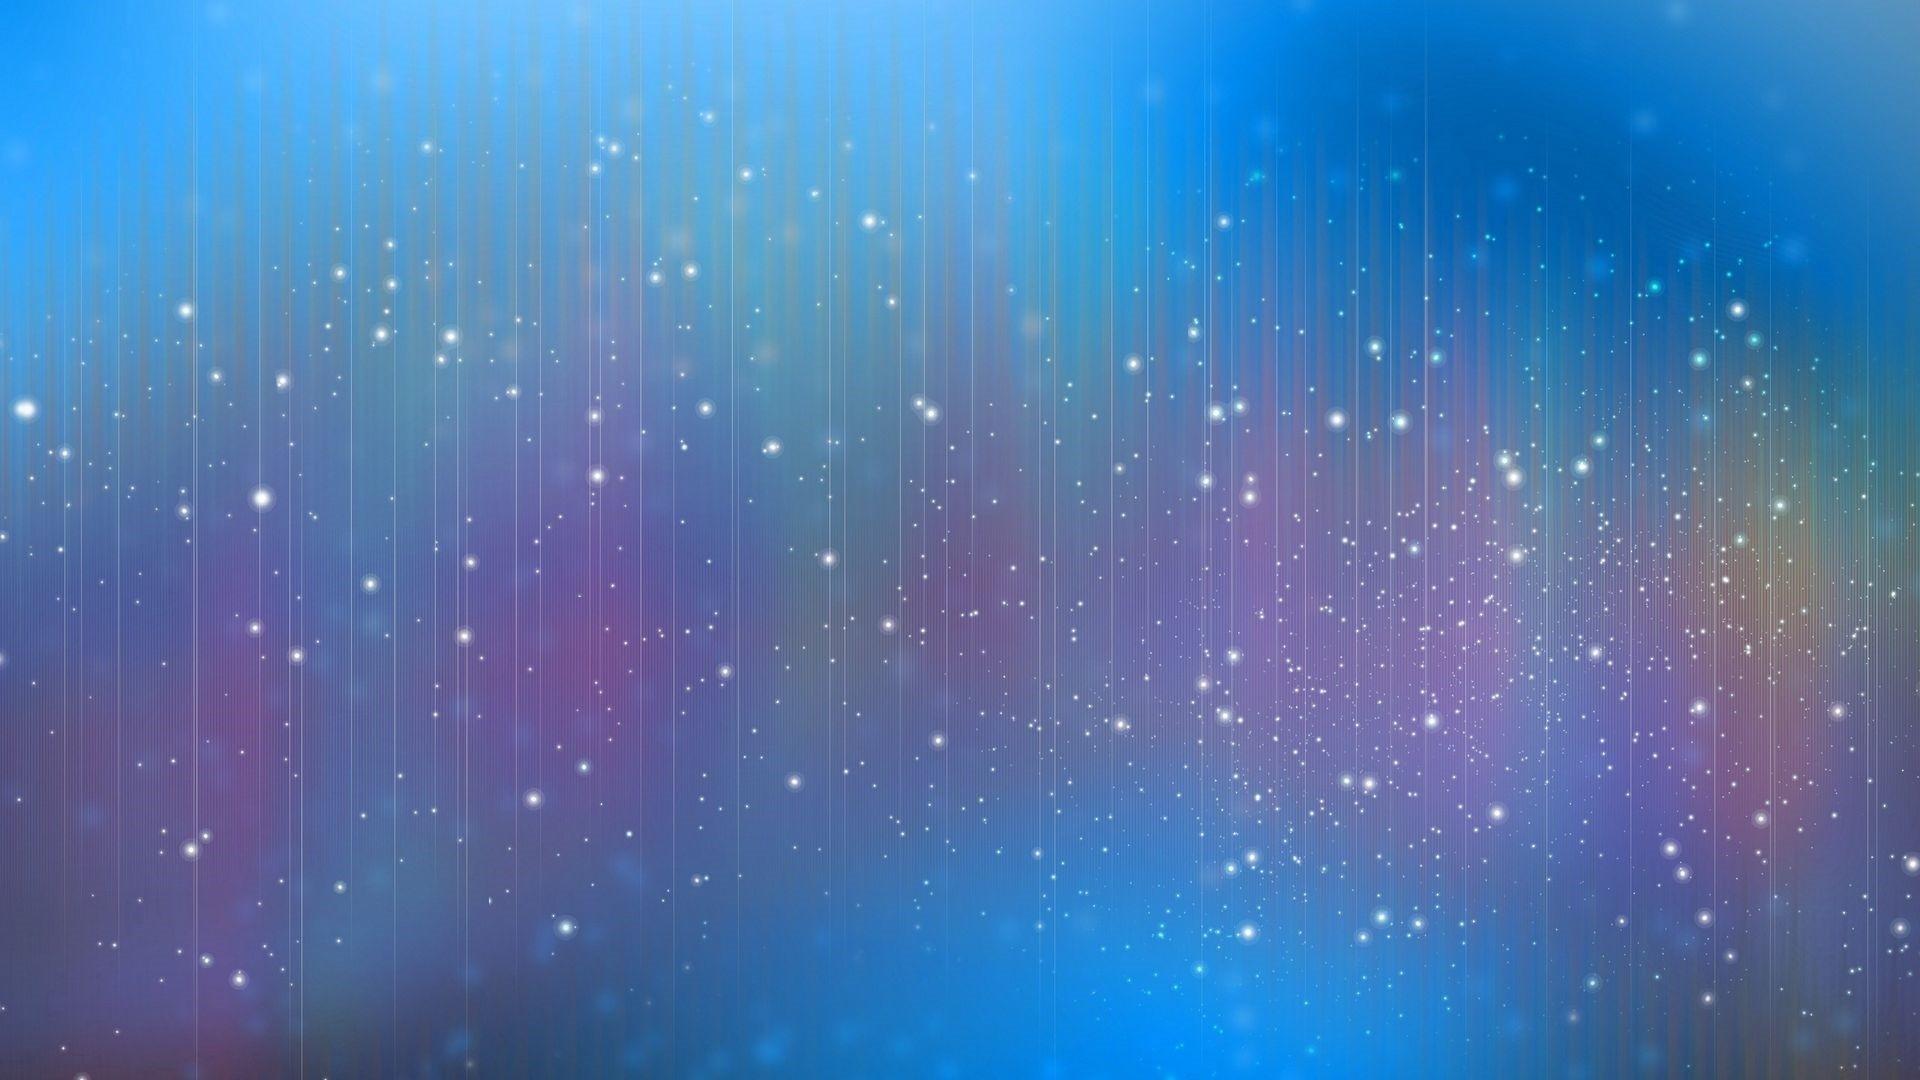 Spark Blue Wallpaper